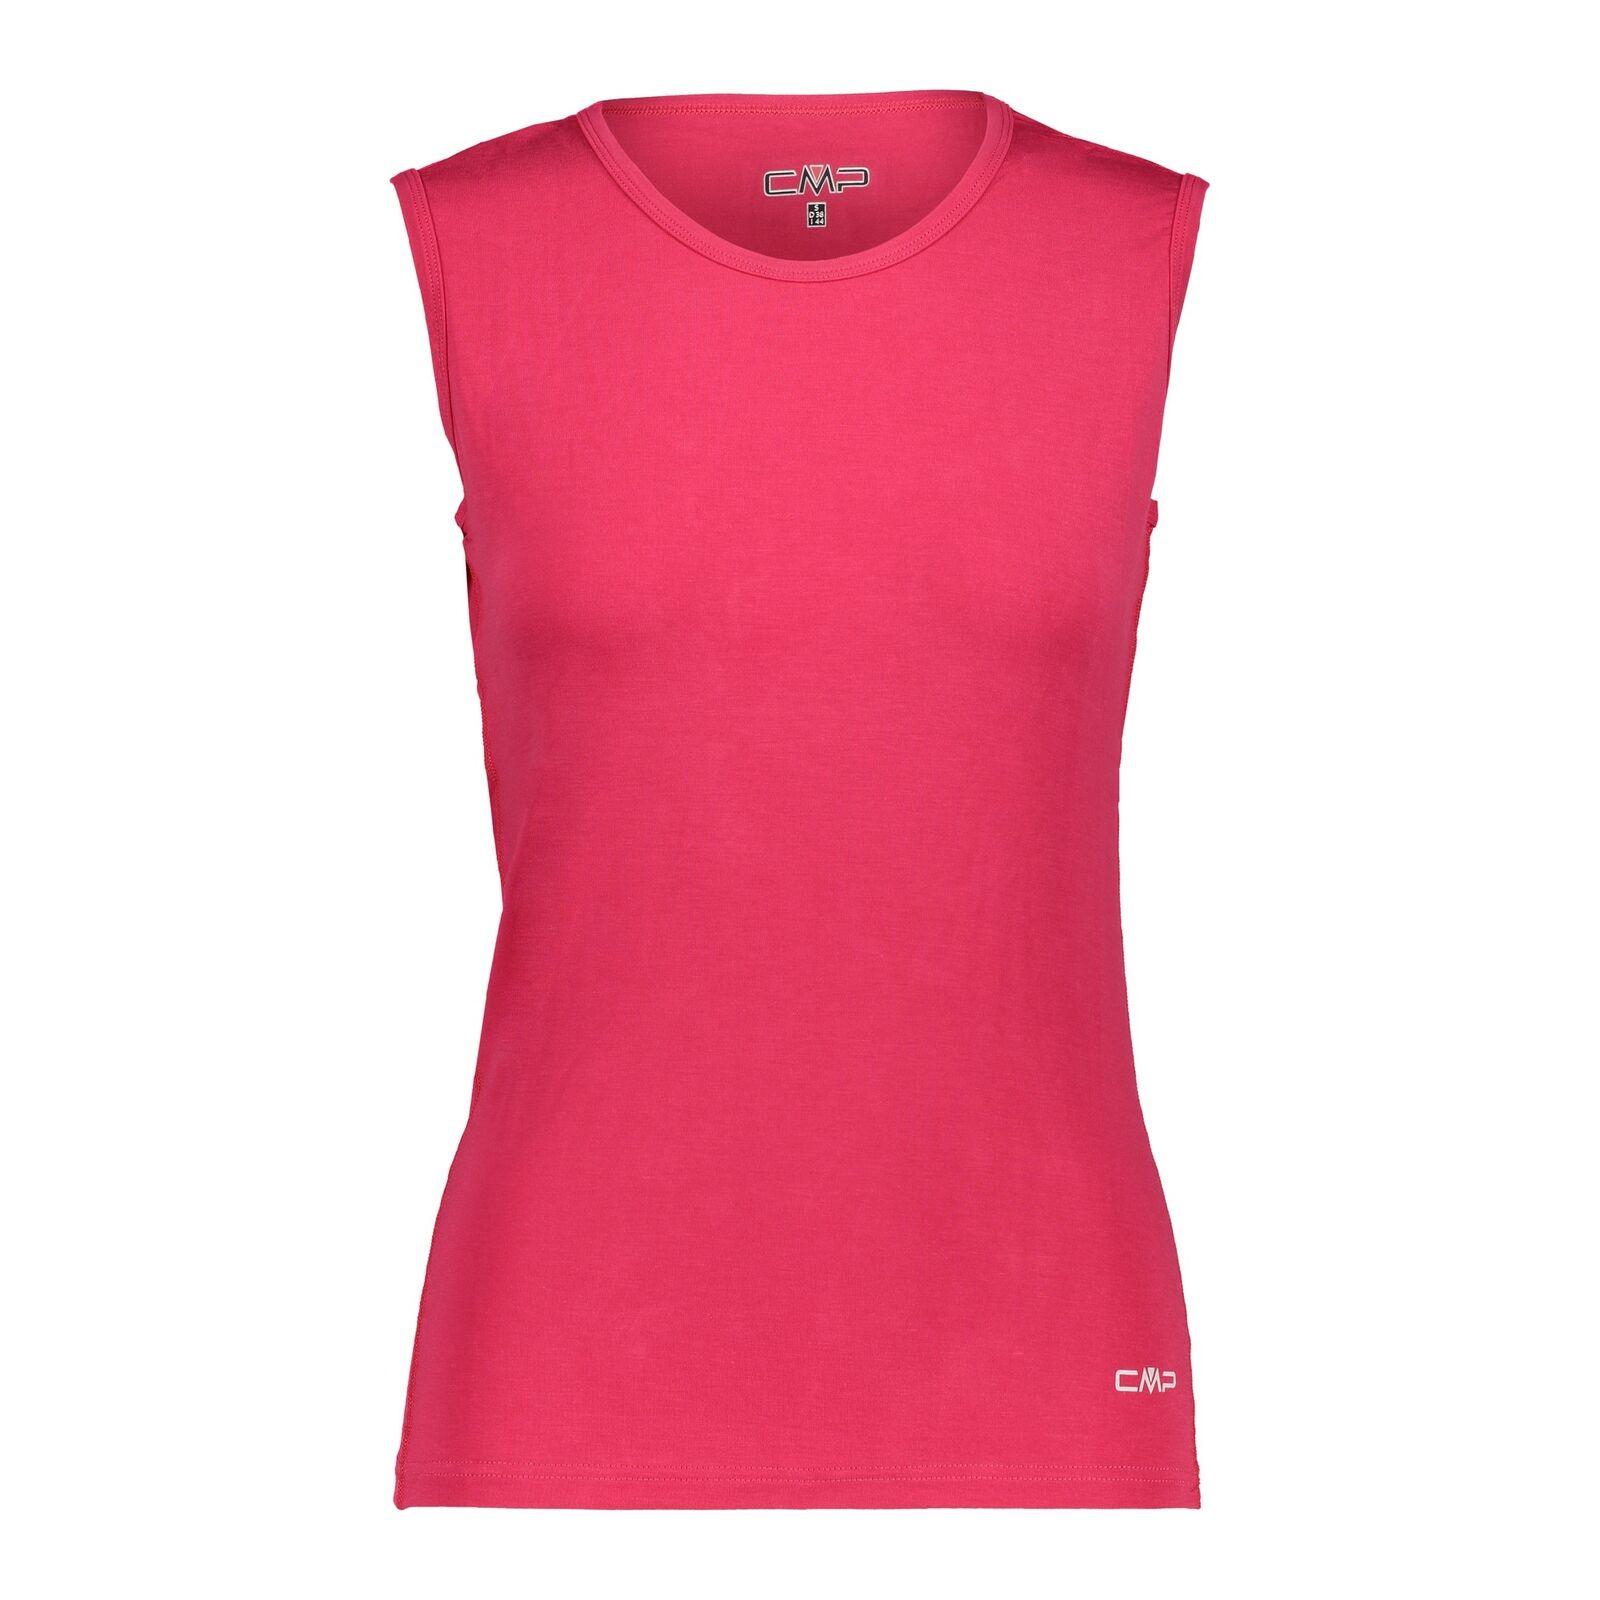 CMP Camisa Funcional Woman camiseta roja transpirable elástica colors lisos